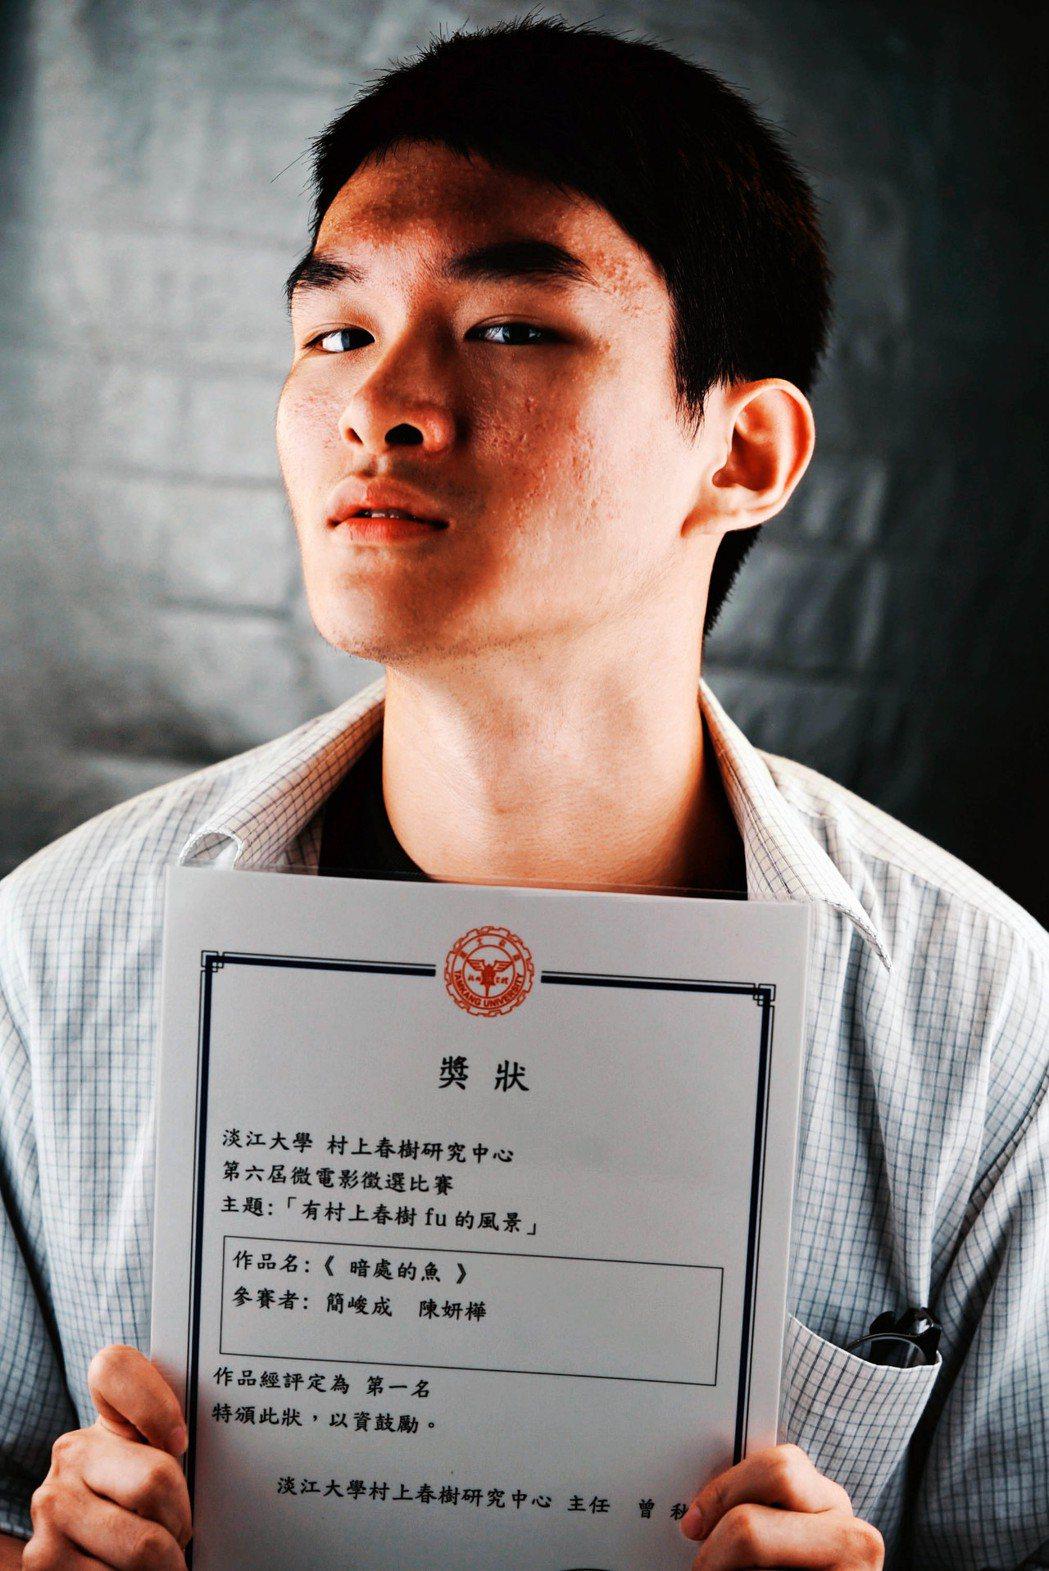 PBL影視專班簡峻成,榮獲第六屆村上春樹微電影比賽冠軍。龍華科大/提供